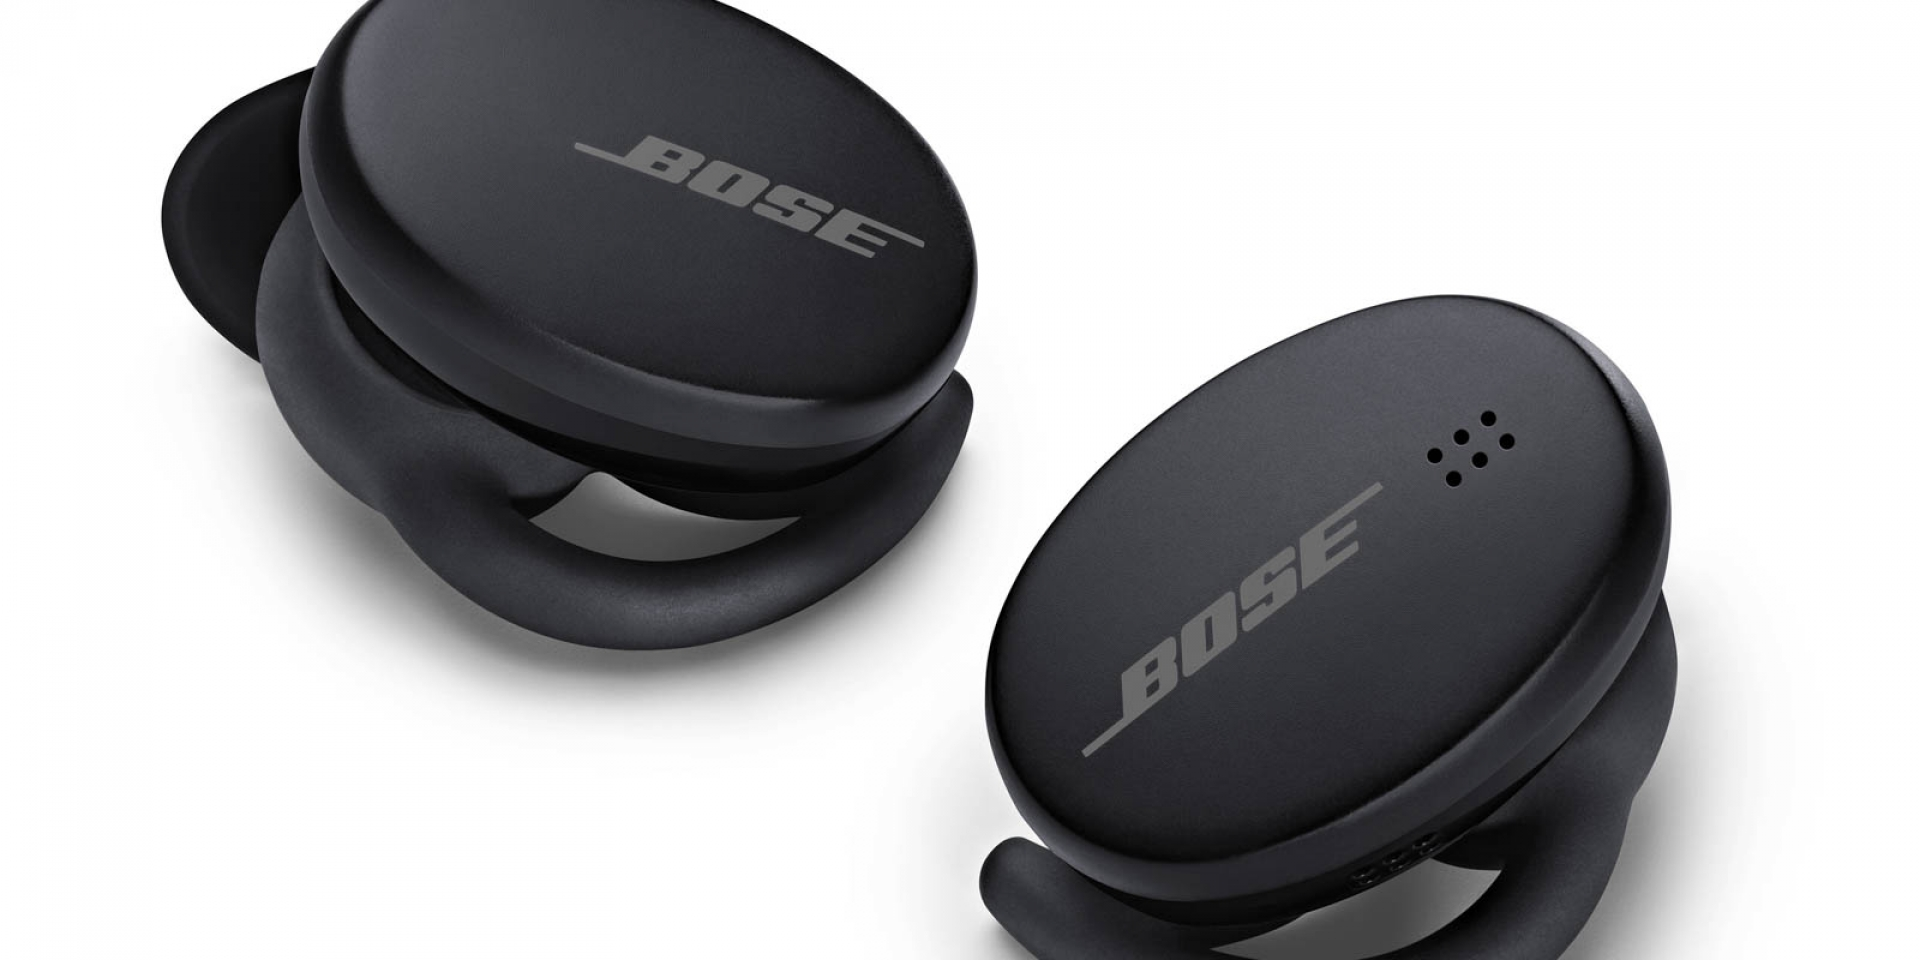 BOSE降噪耳機再添新成員,QuietComfort Earbuds「號稱」有史以來入耳降噪最強